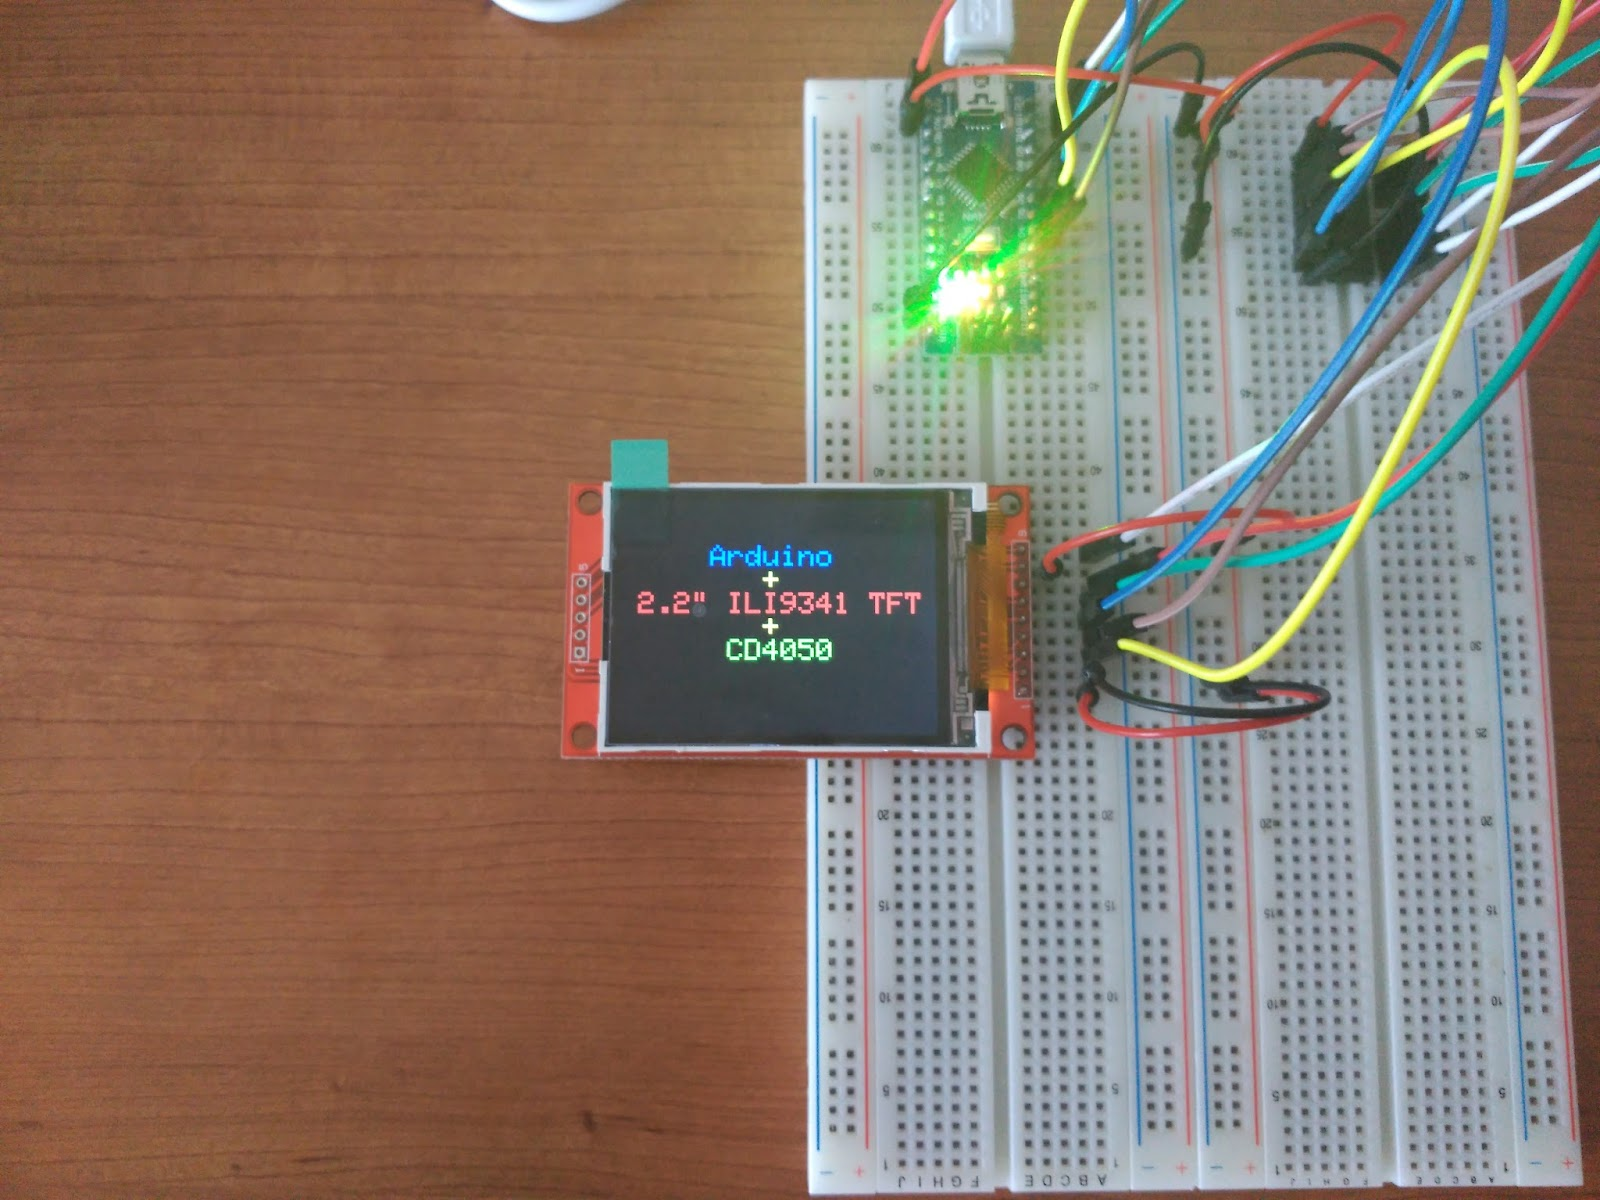 Arduino + 2 2 inches ILI9341 TFT + CD4050 - Nebur Tech Space